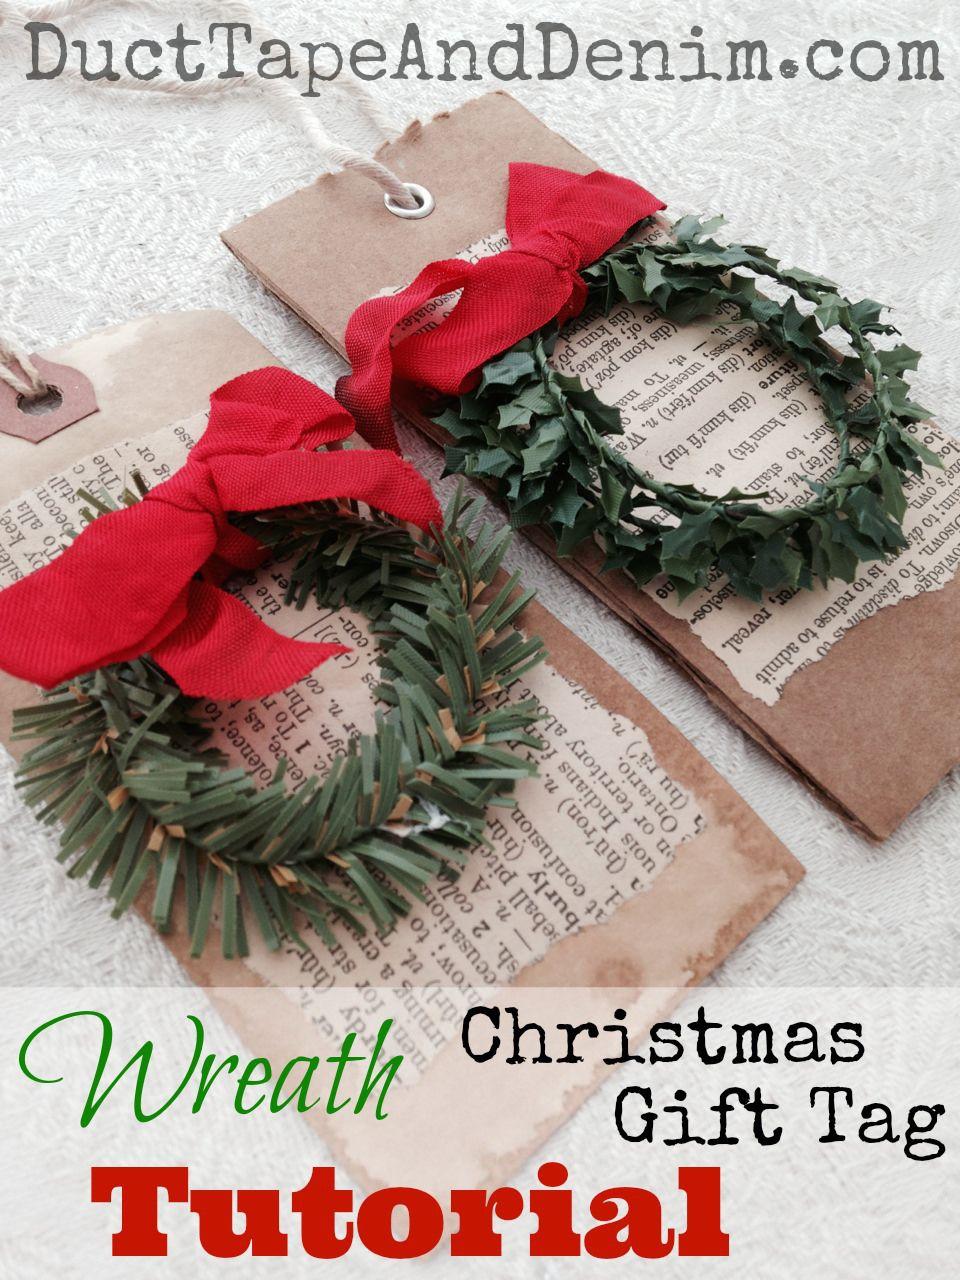 Wreath Christmas Gift Tag Tutorial | Pinterest | Wreaths, Tutorials ...